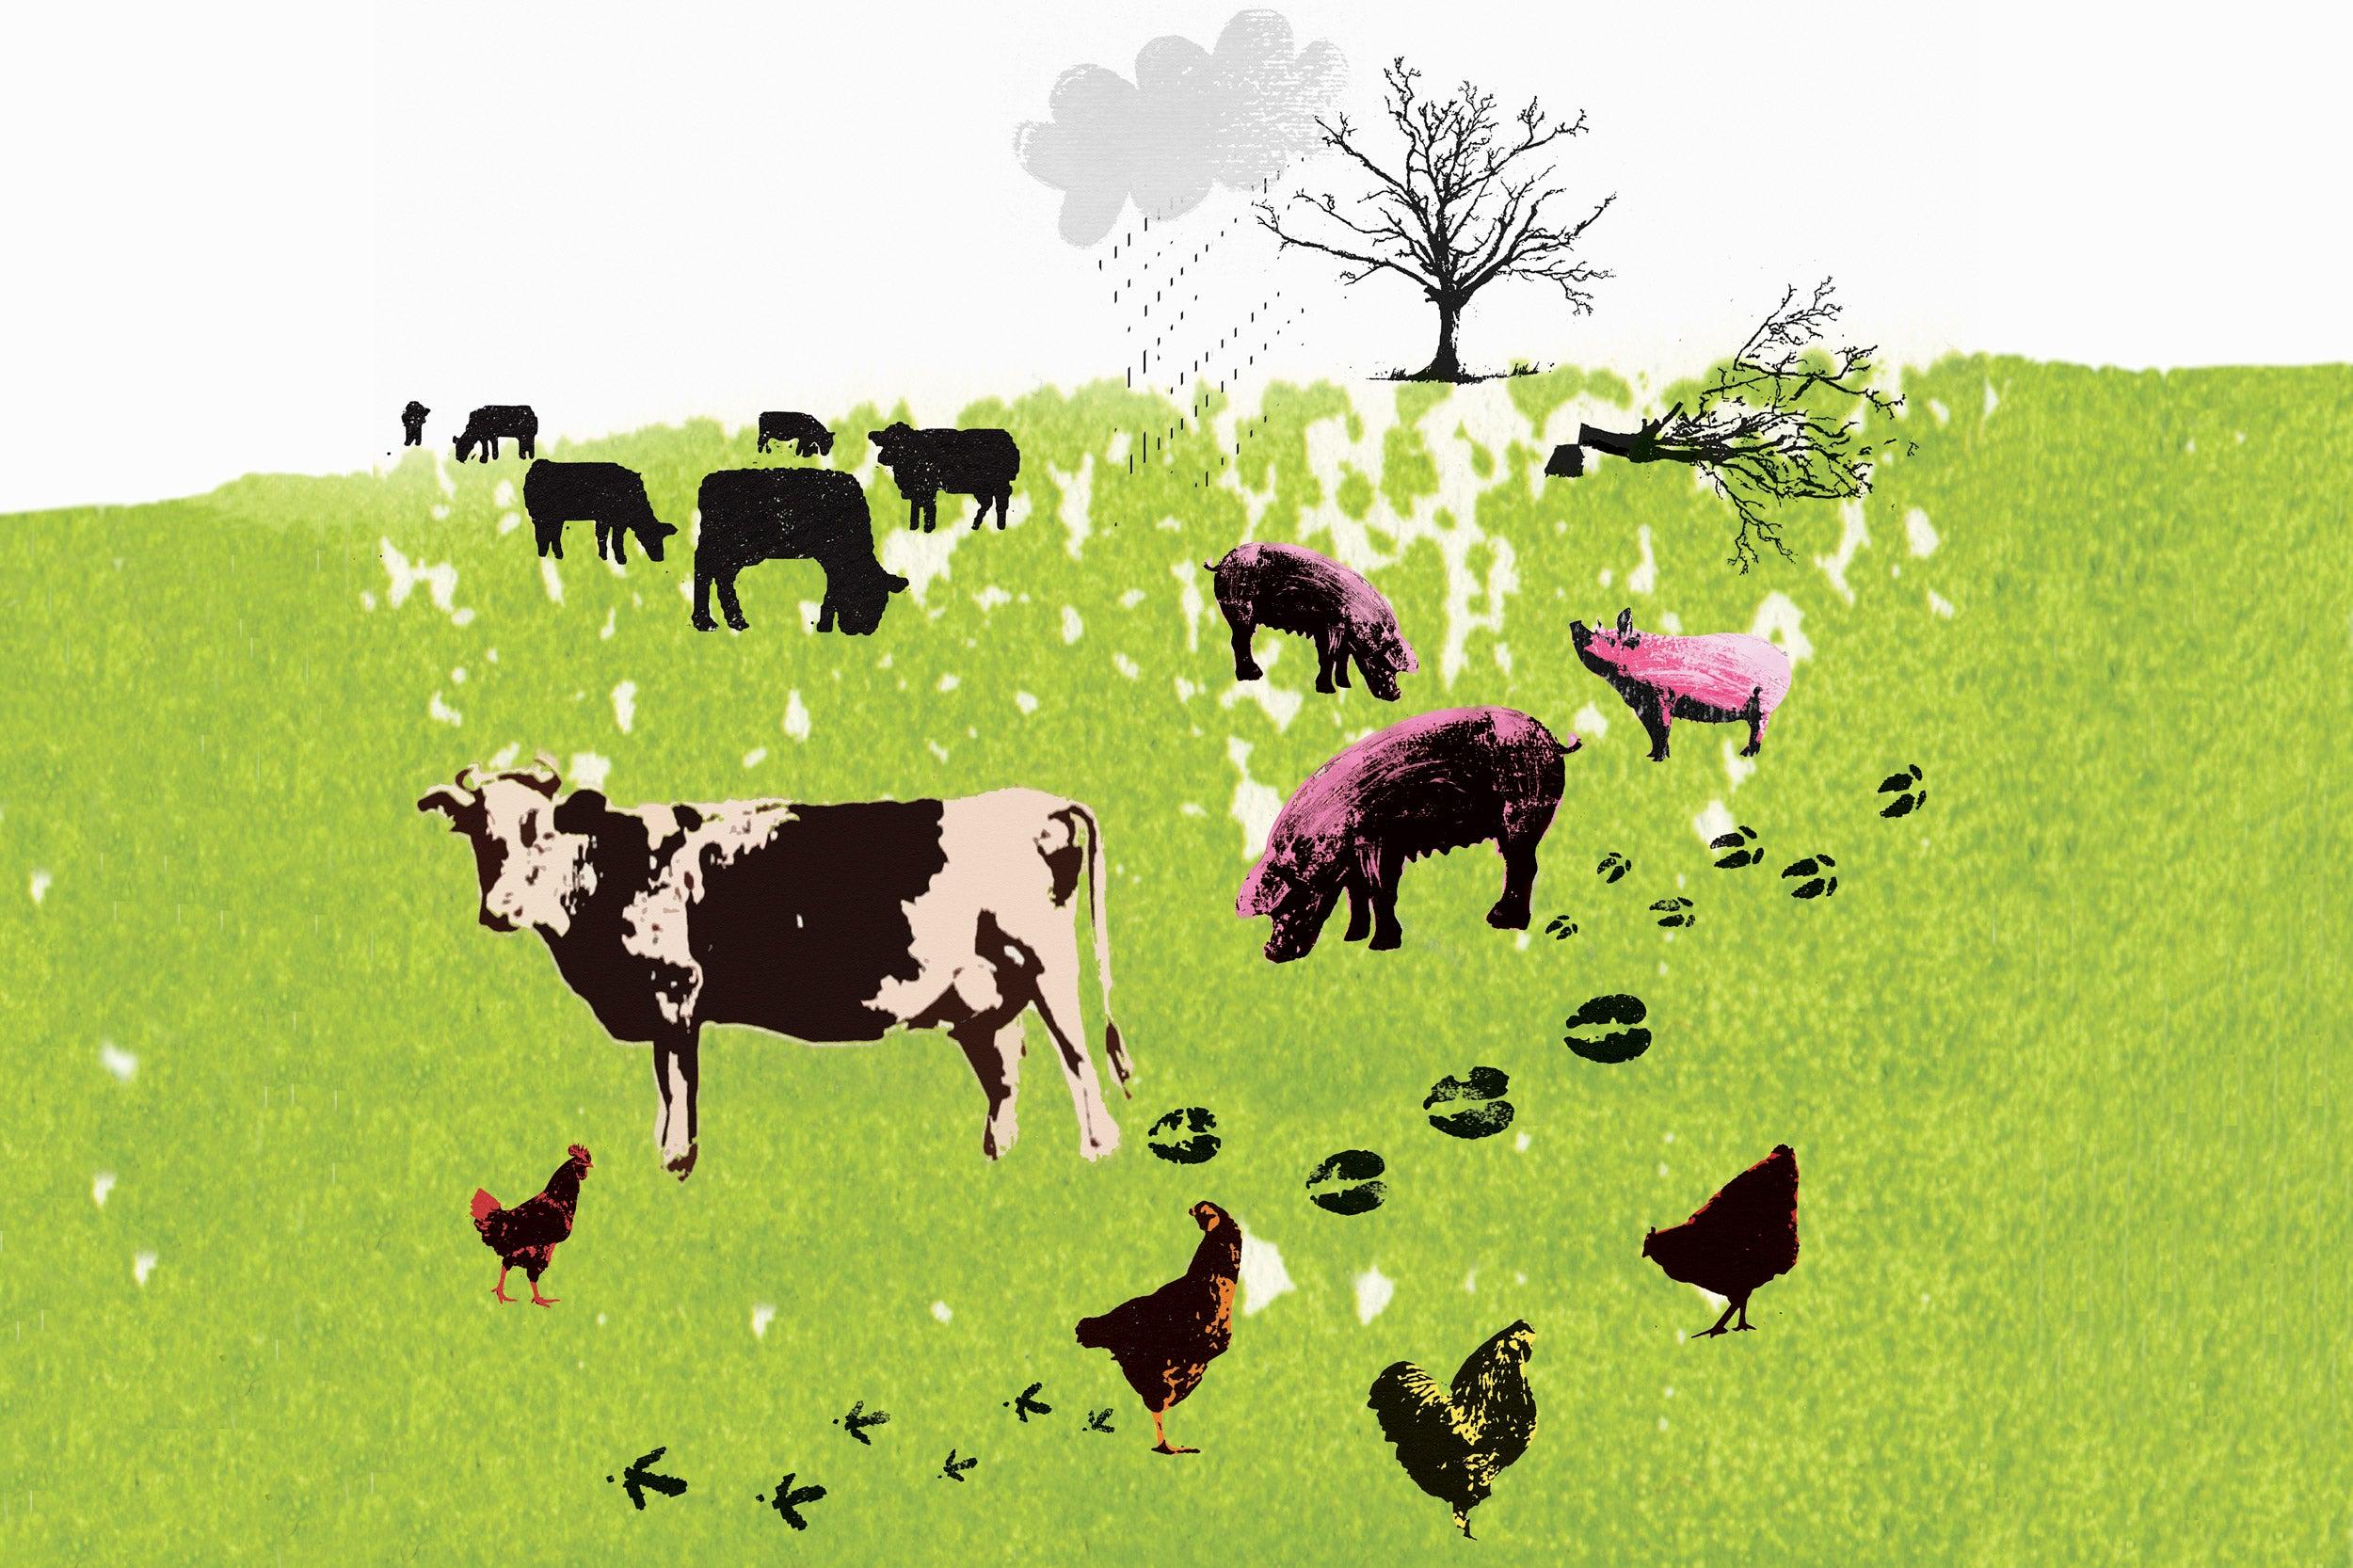 Illustration of farm animals in a field.